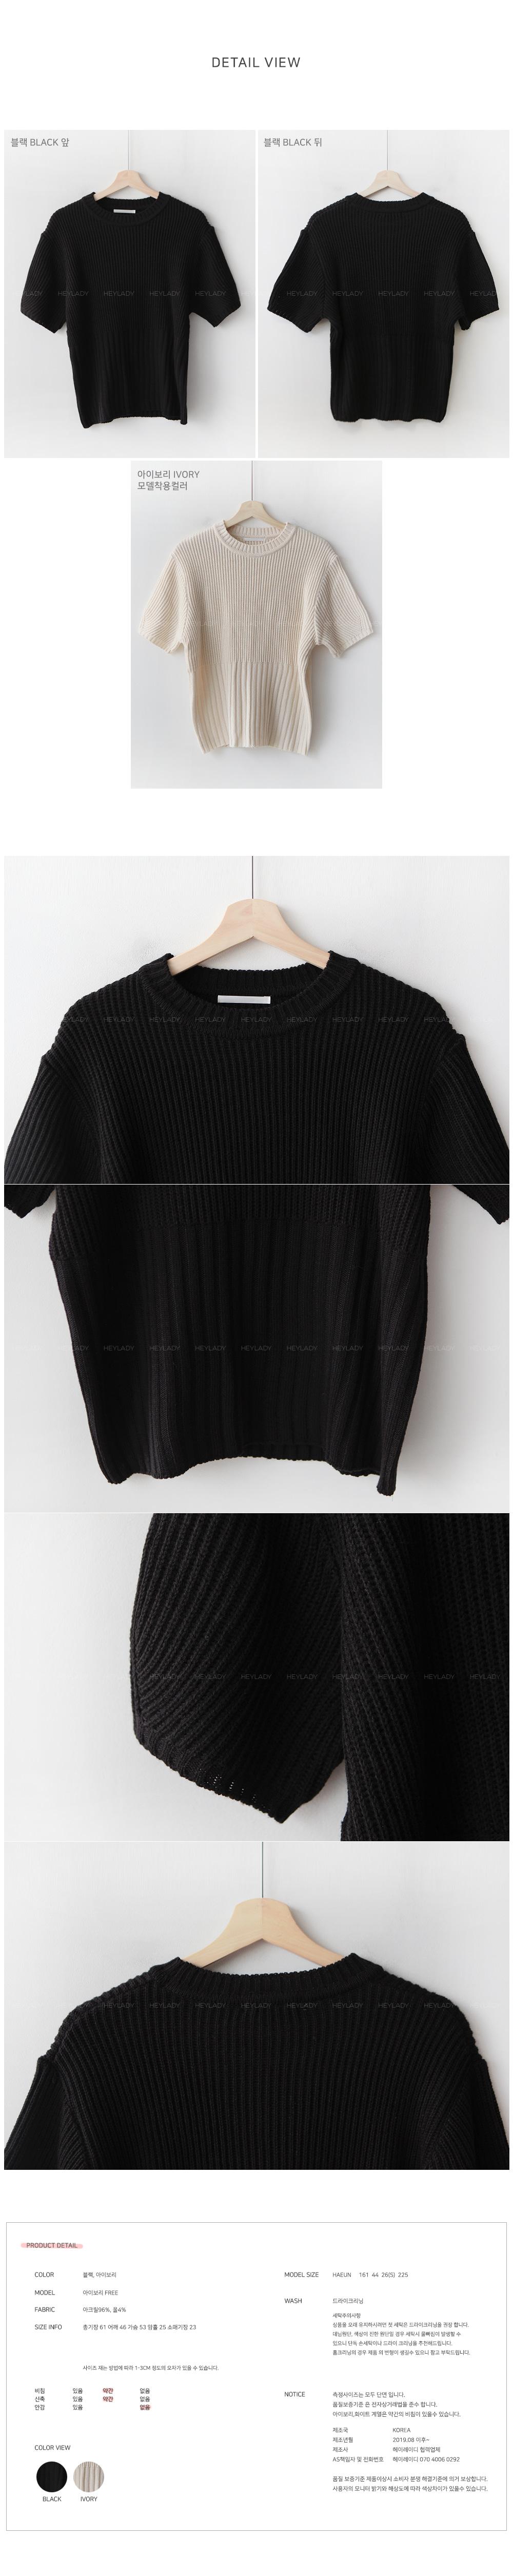 Hopper wool short sleeve knit